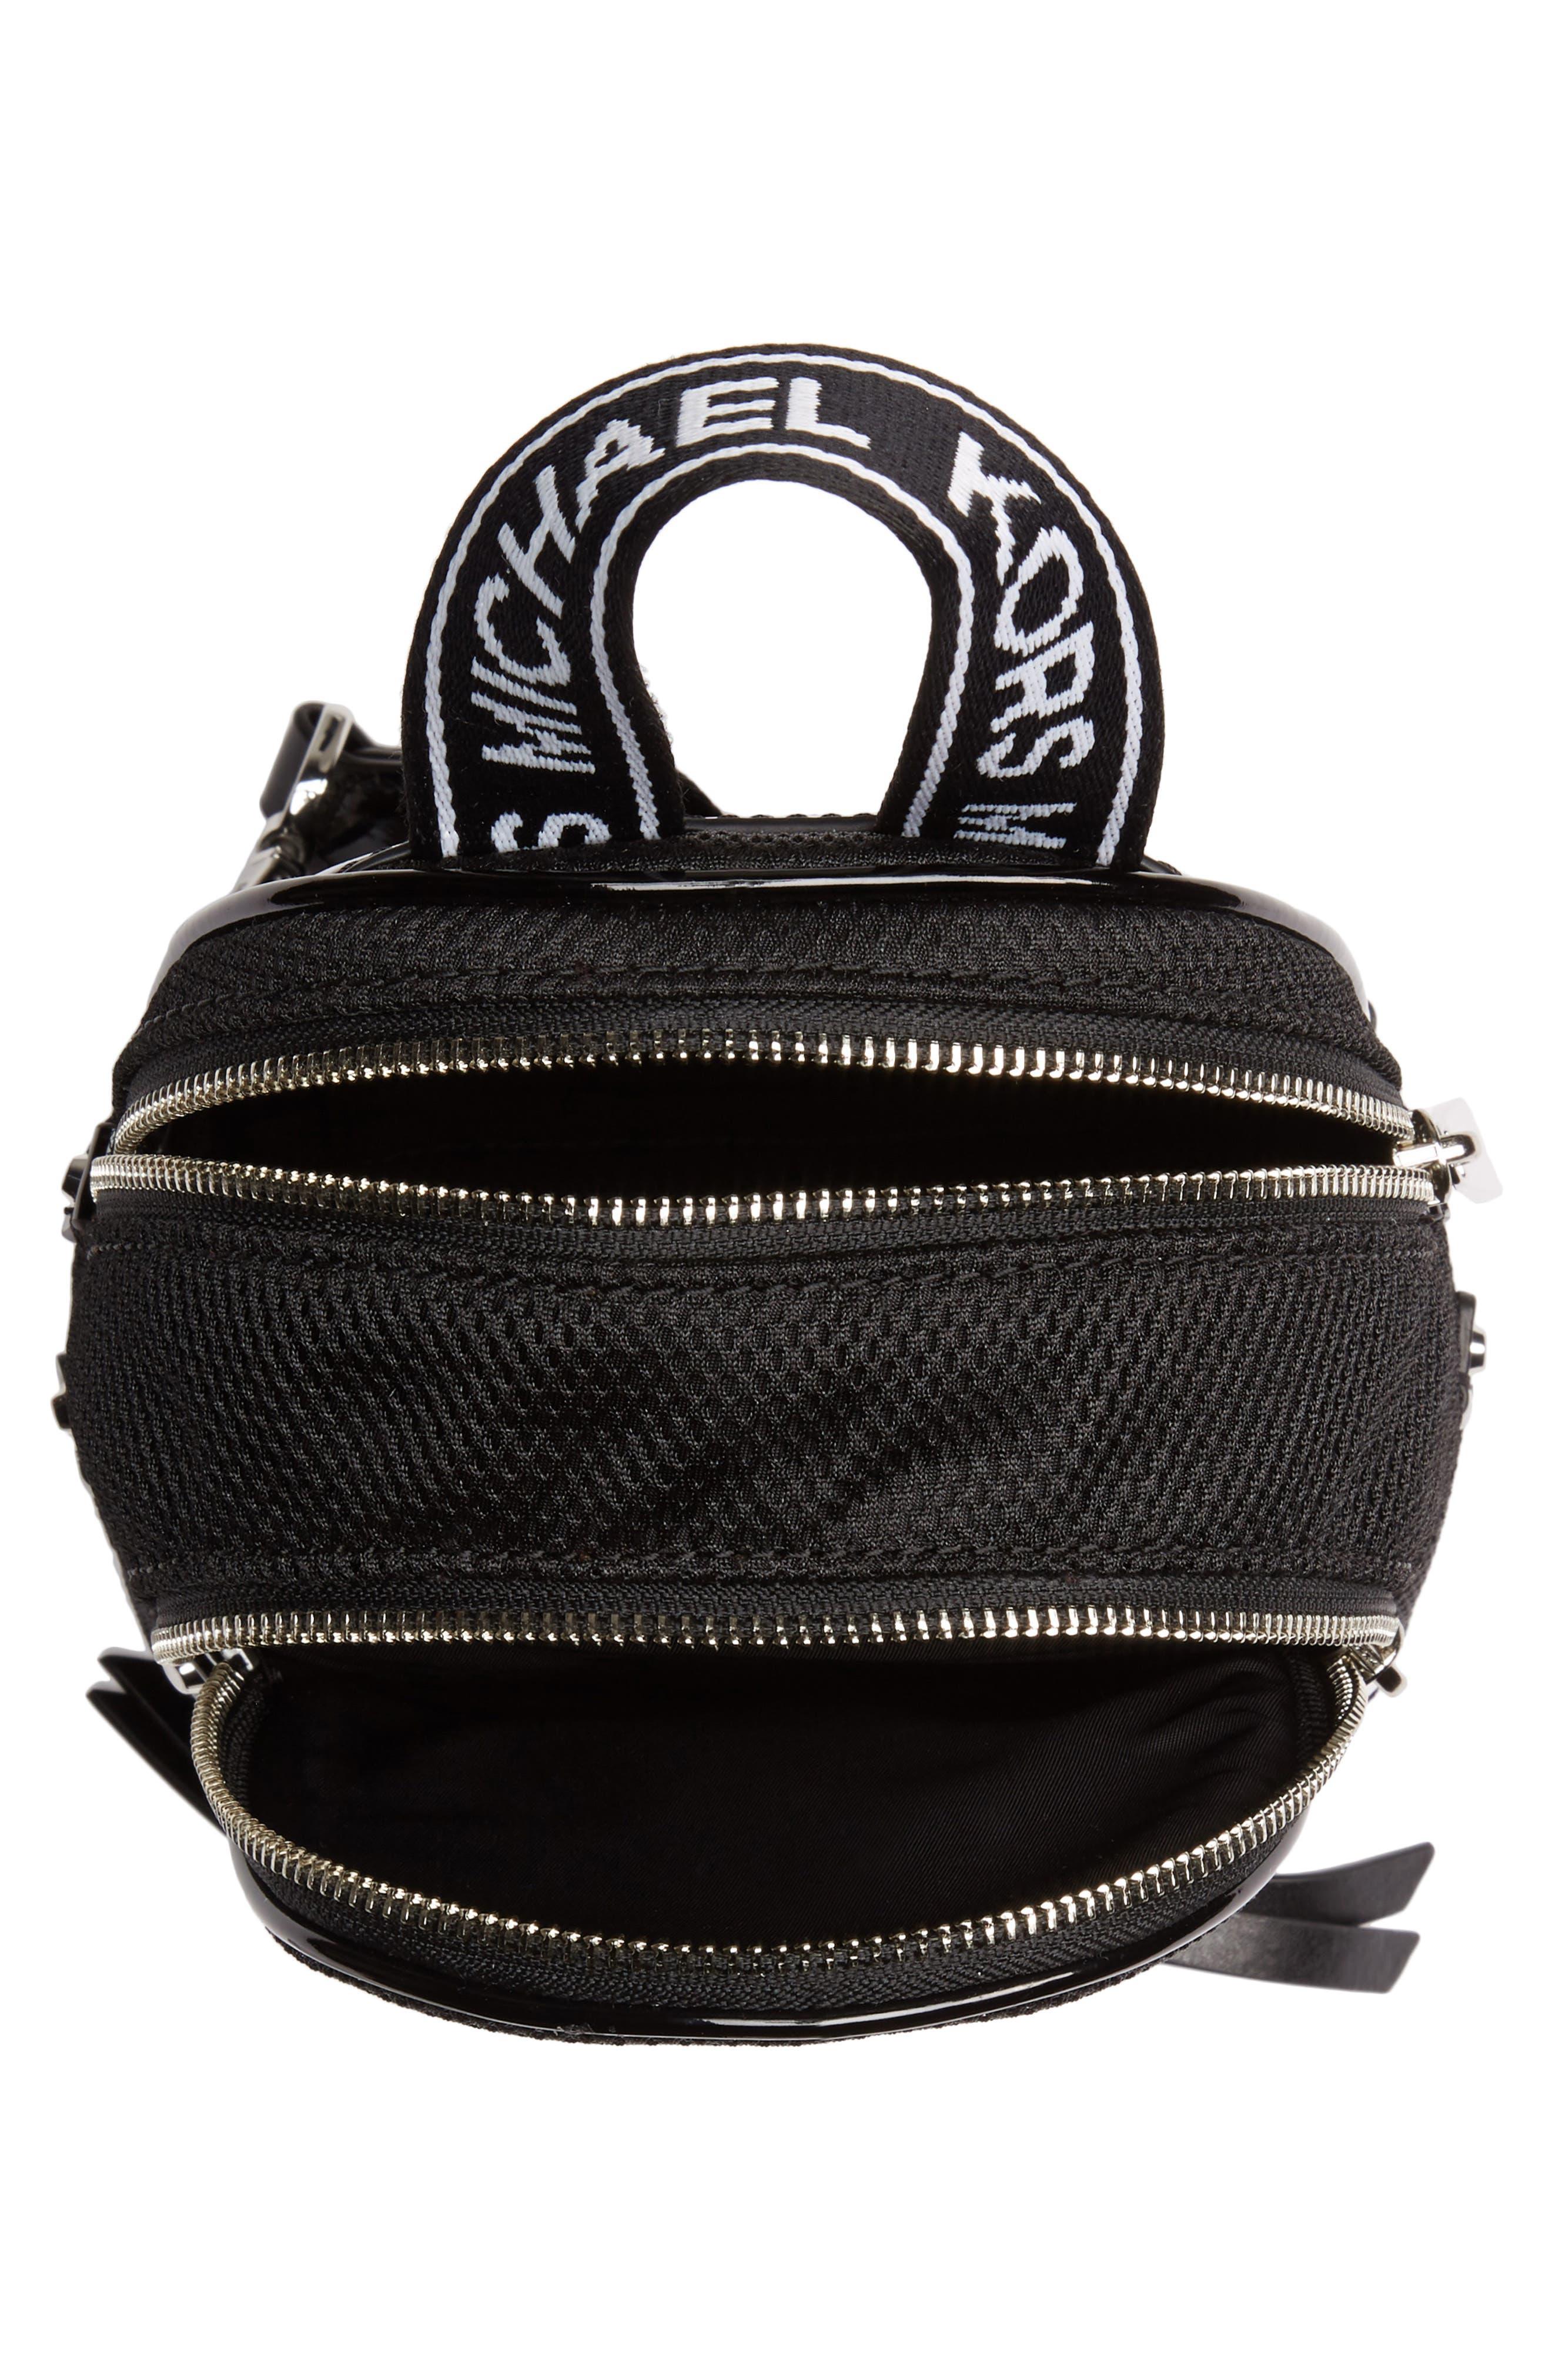 MICHAEL MICHAEL KORS, Extra Small Rhea Mesh Backpack, Alternate thumbnail 6, color, BLACK/ OPTIC WHITE